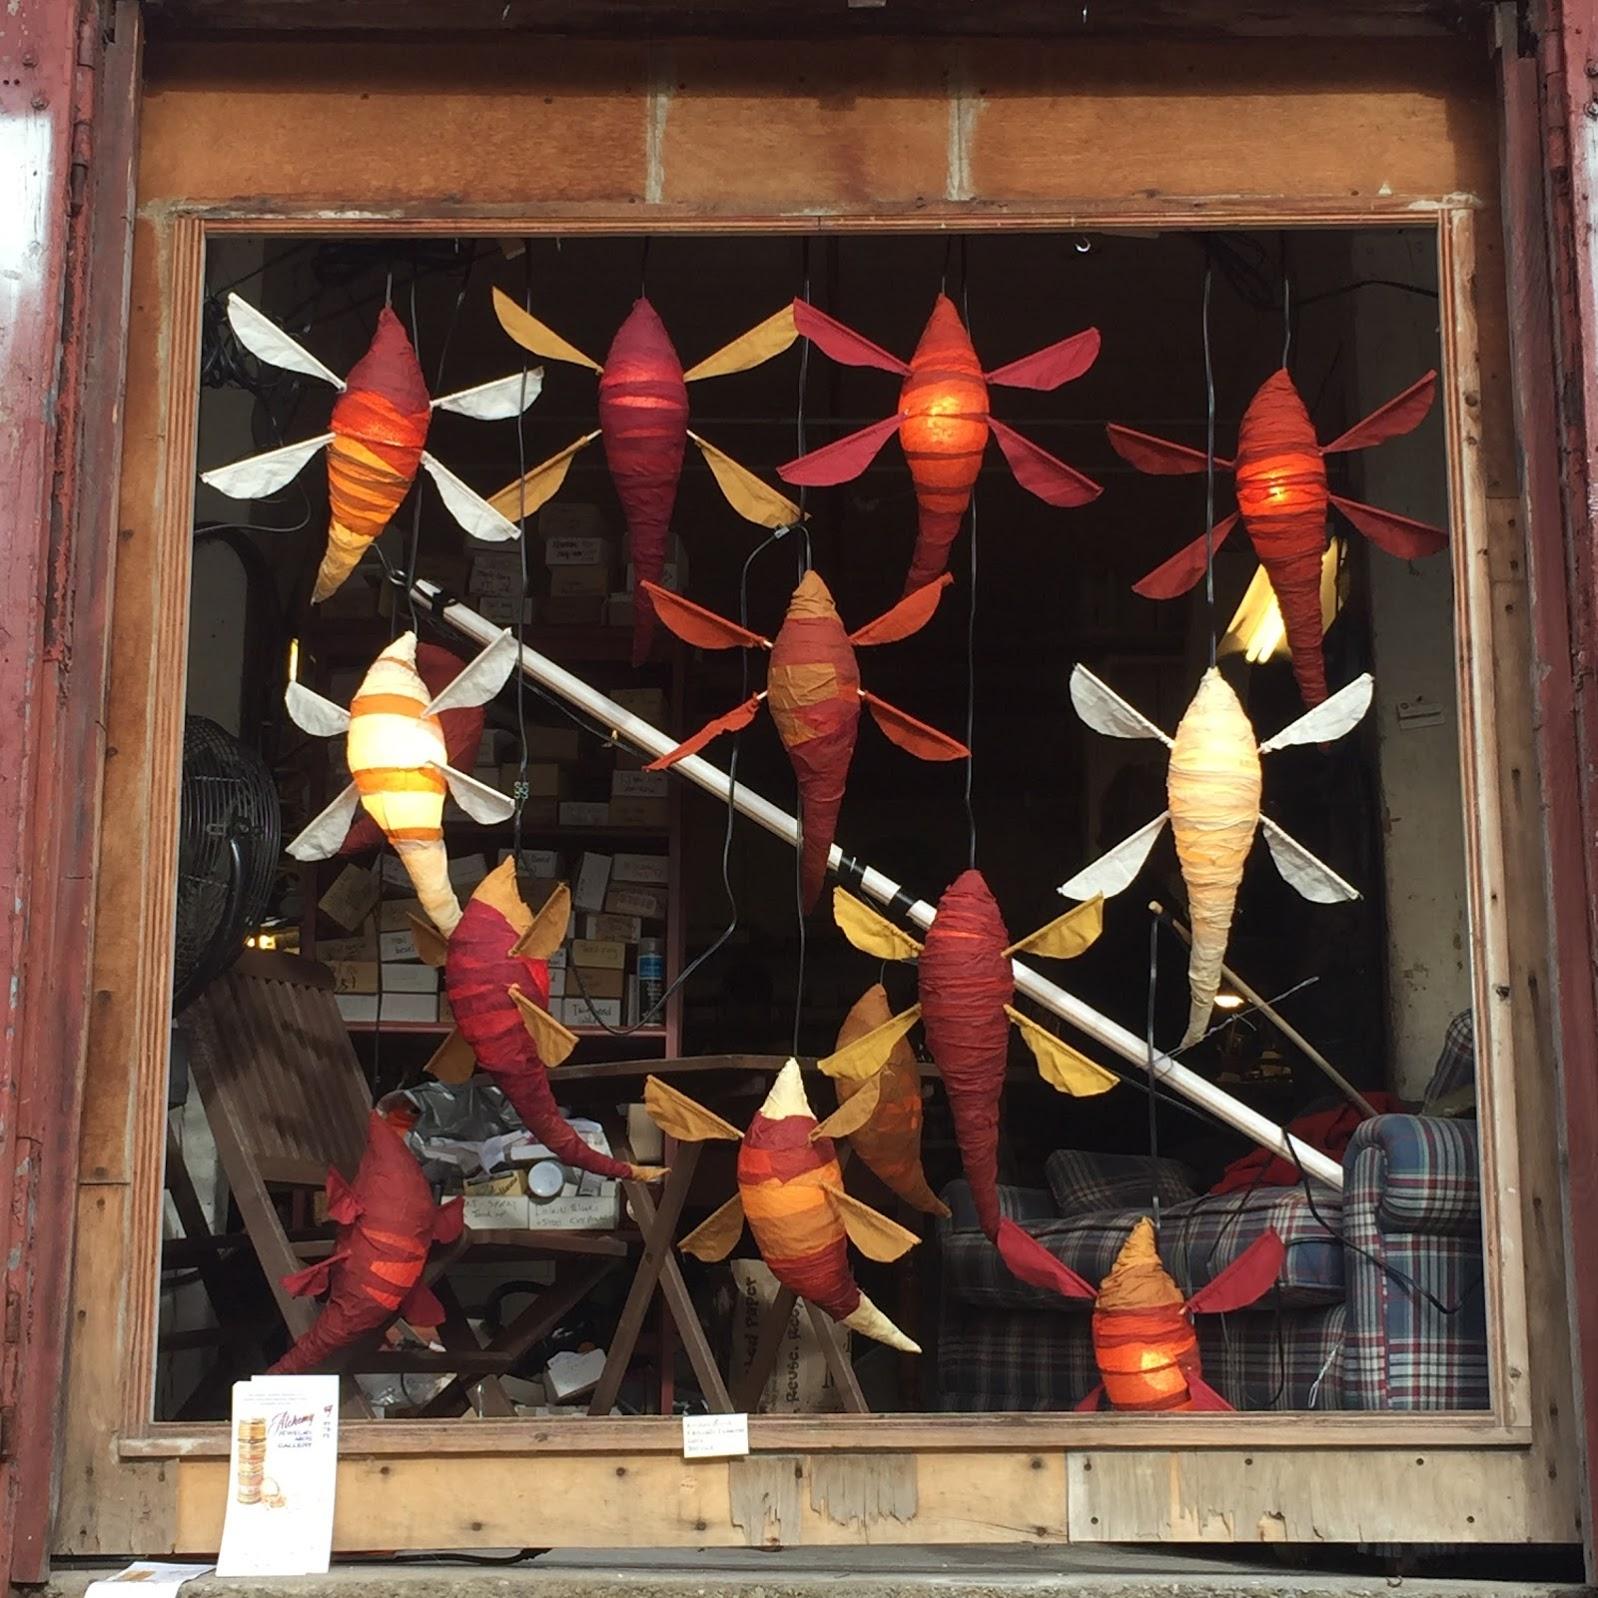 chrysalis_window_day.JPG